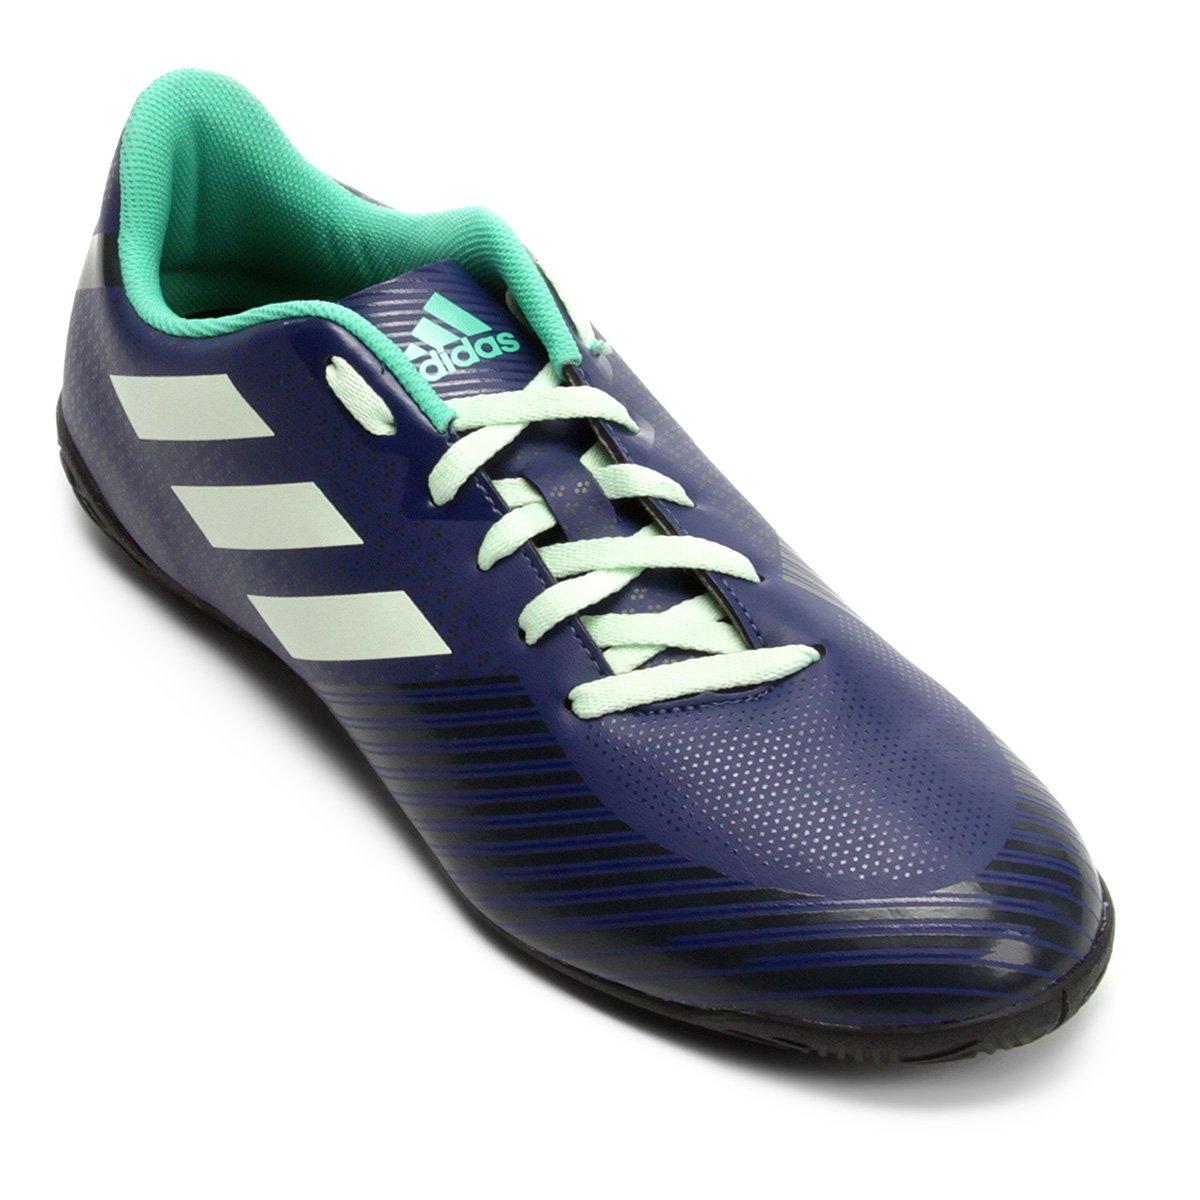 5aeff0b70f Chuteira Futsal Adidas Artilheira 18 IN - Azul e Verde